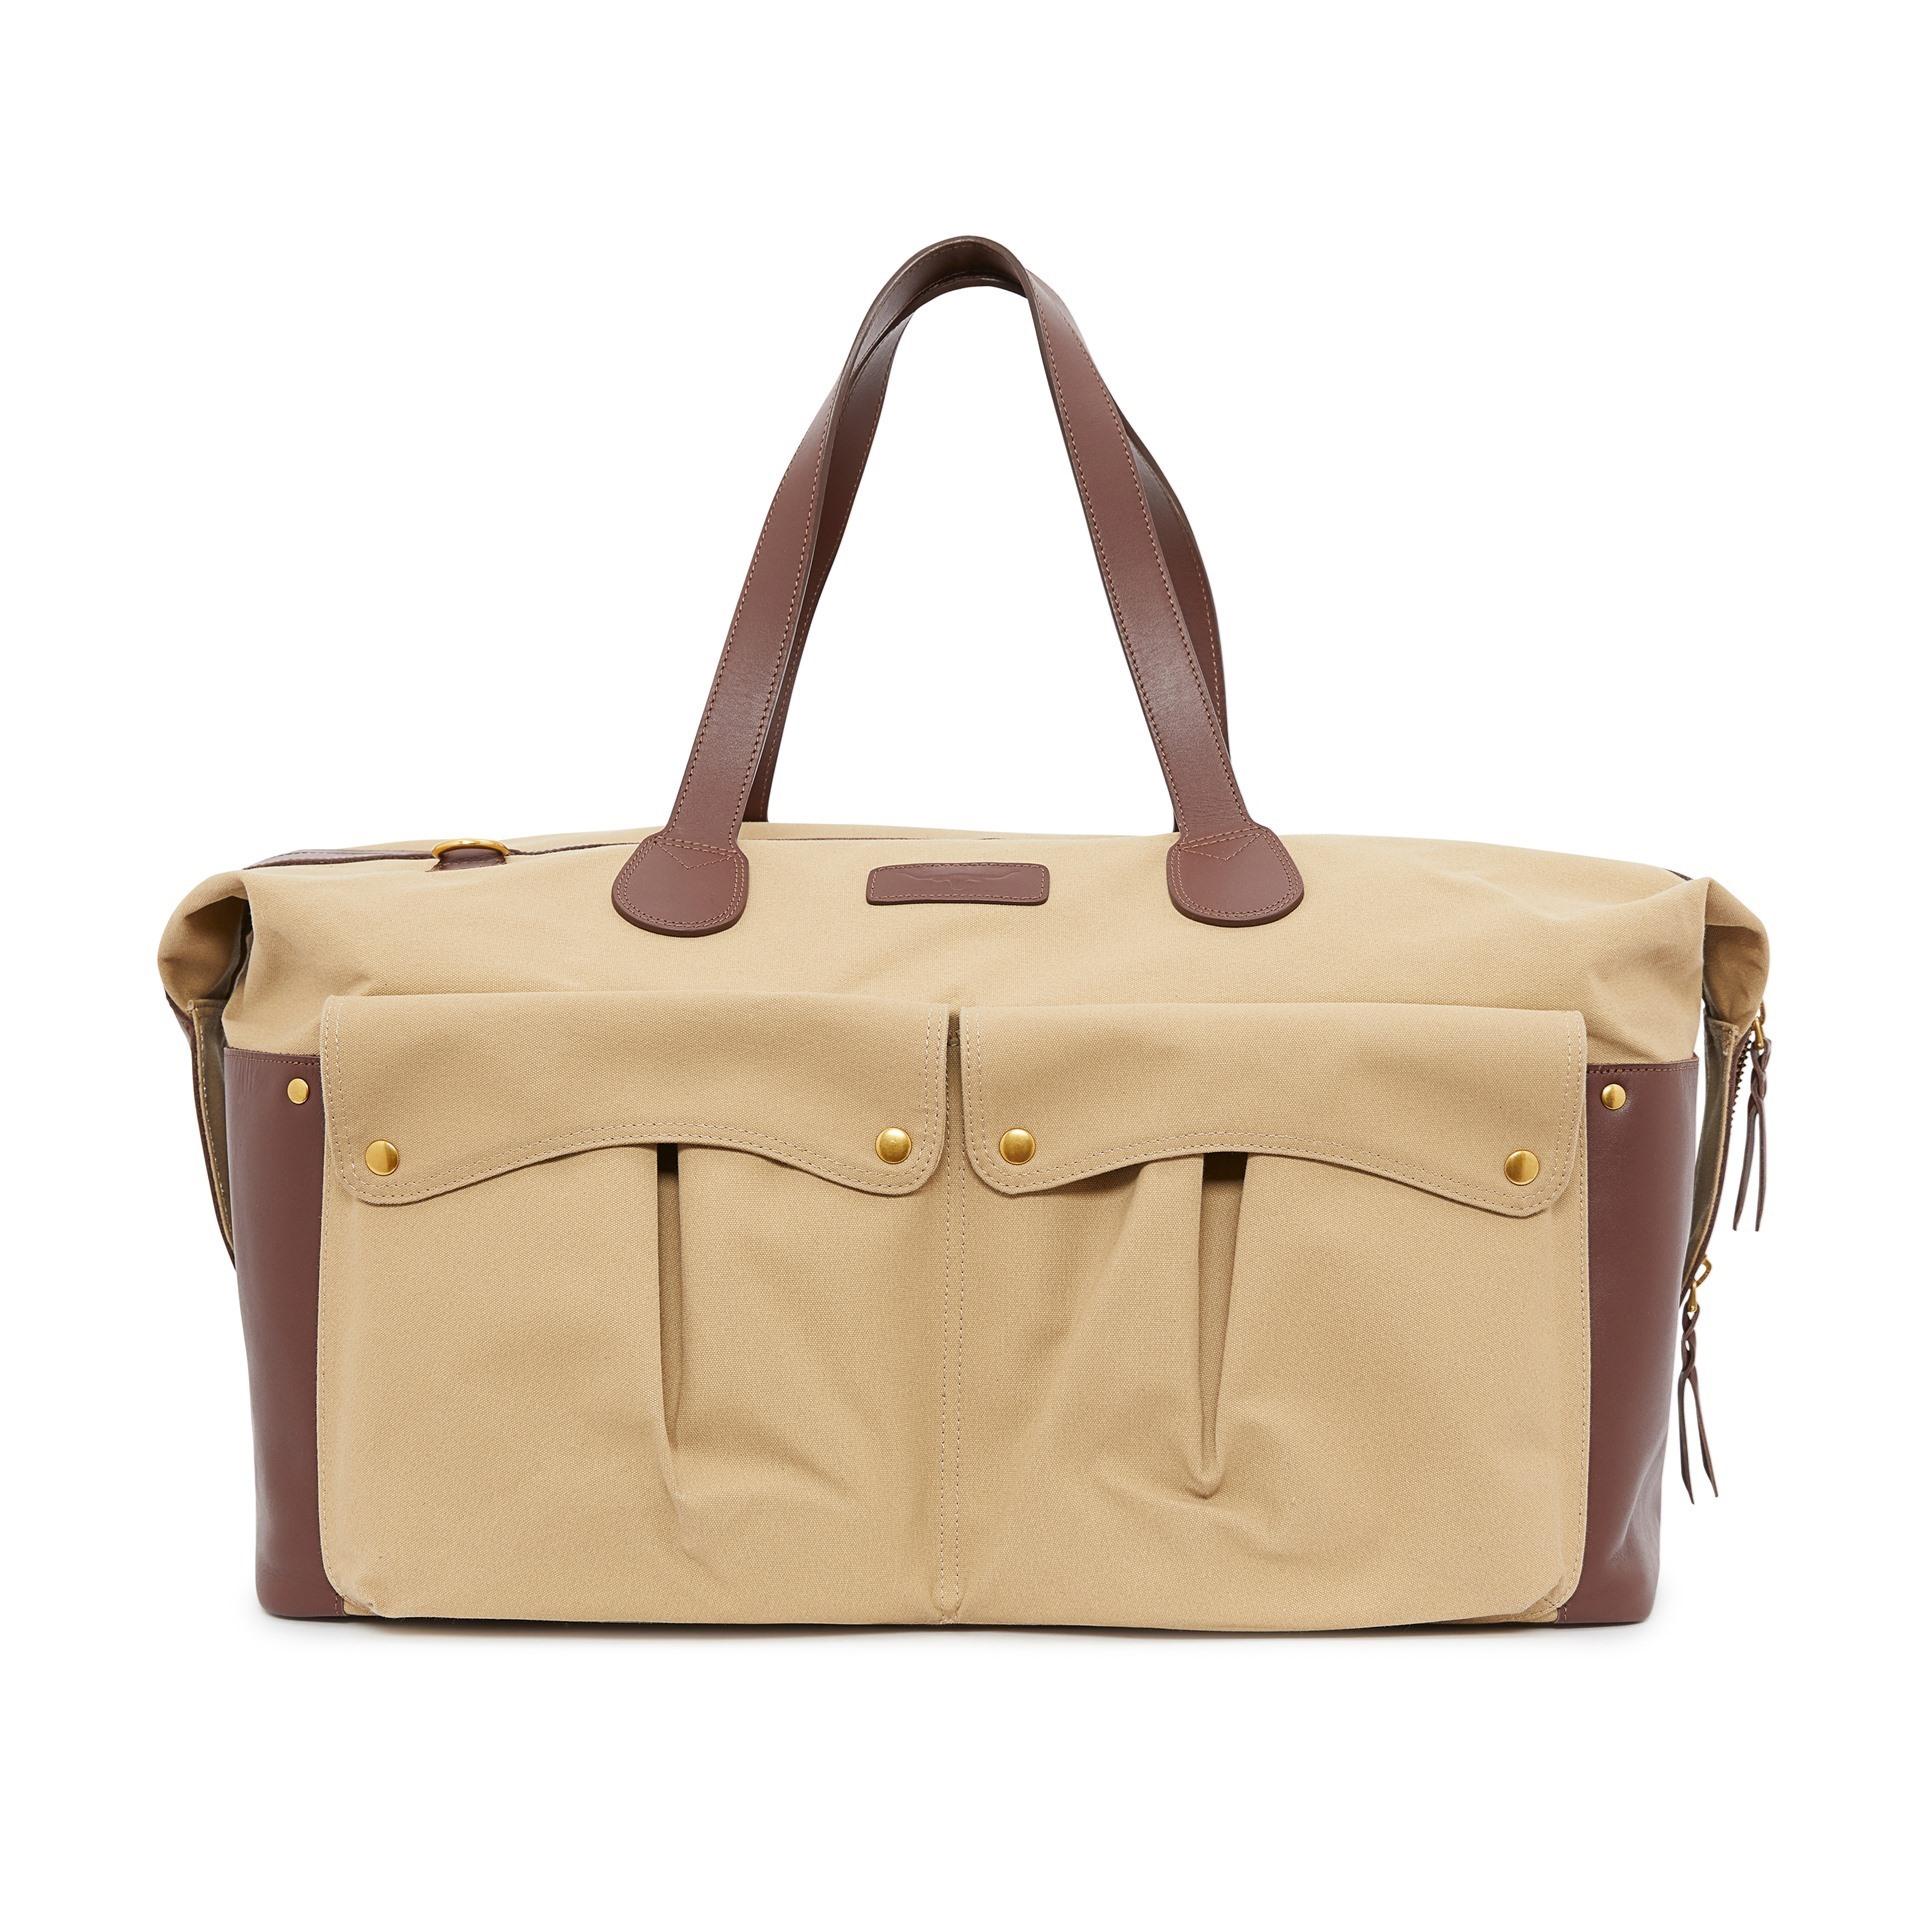 0002243_rm-williams-gippsland-duffle-bag